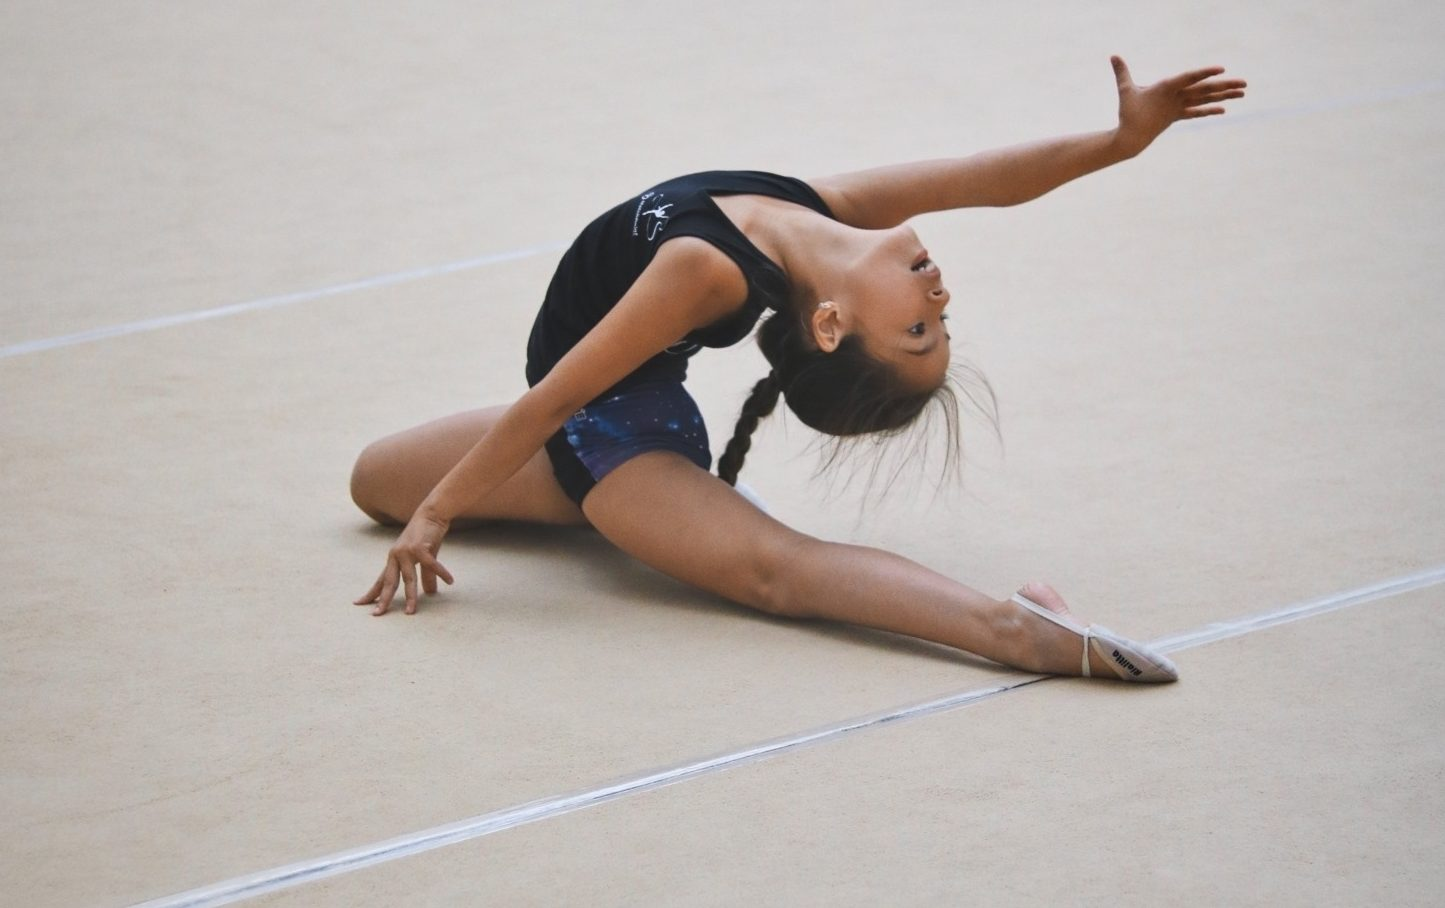 MatchPoint NYC Gymnastics